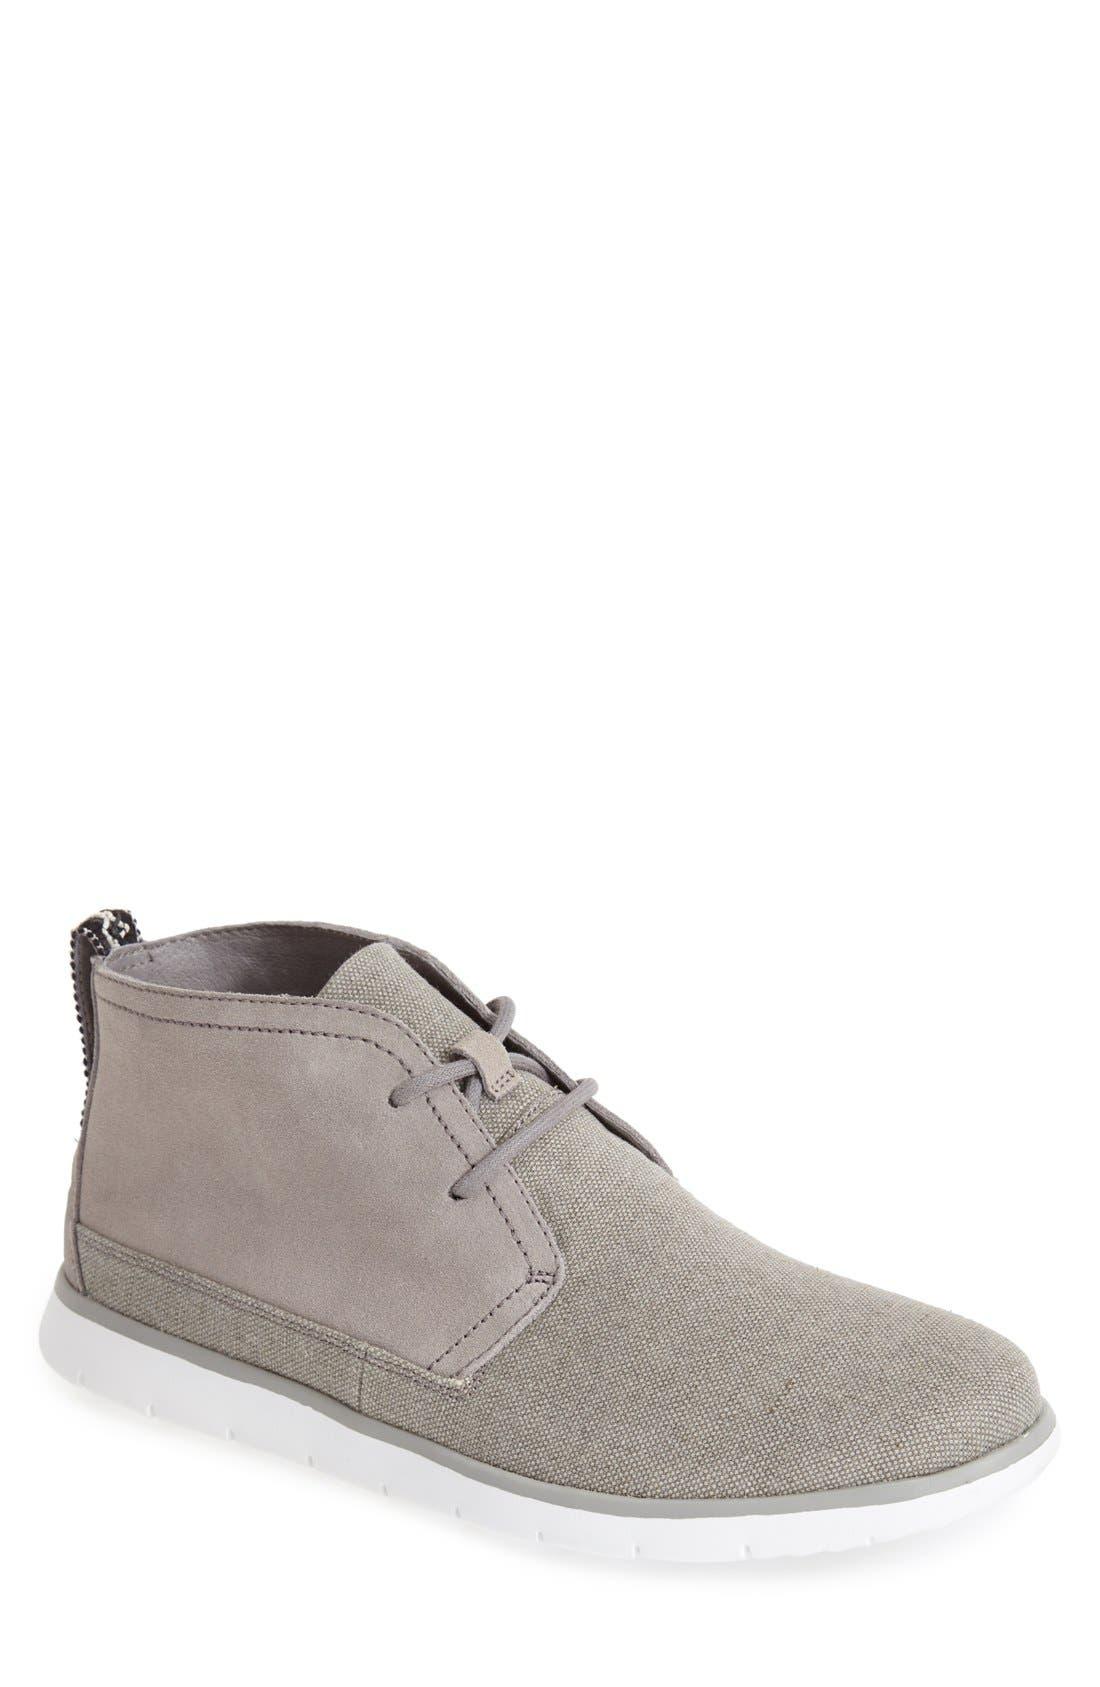 Main Image - UGG® 'Freamon' Chukka Sneaker (Men)